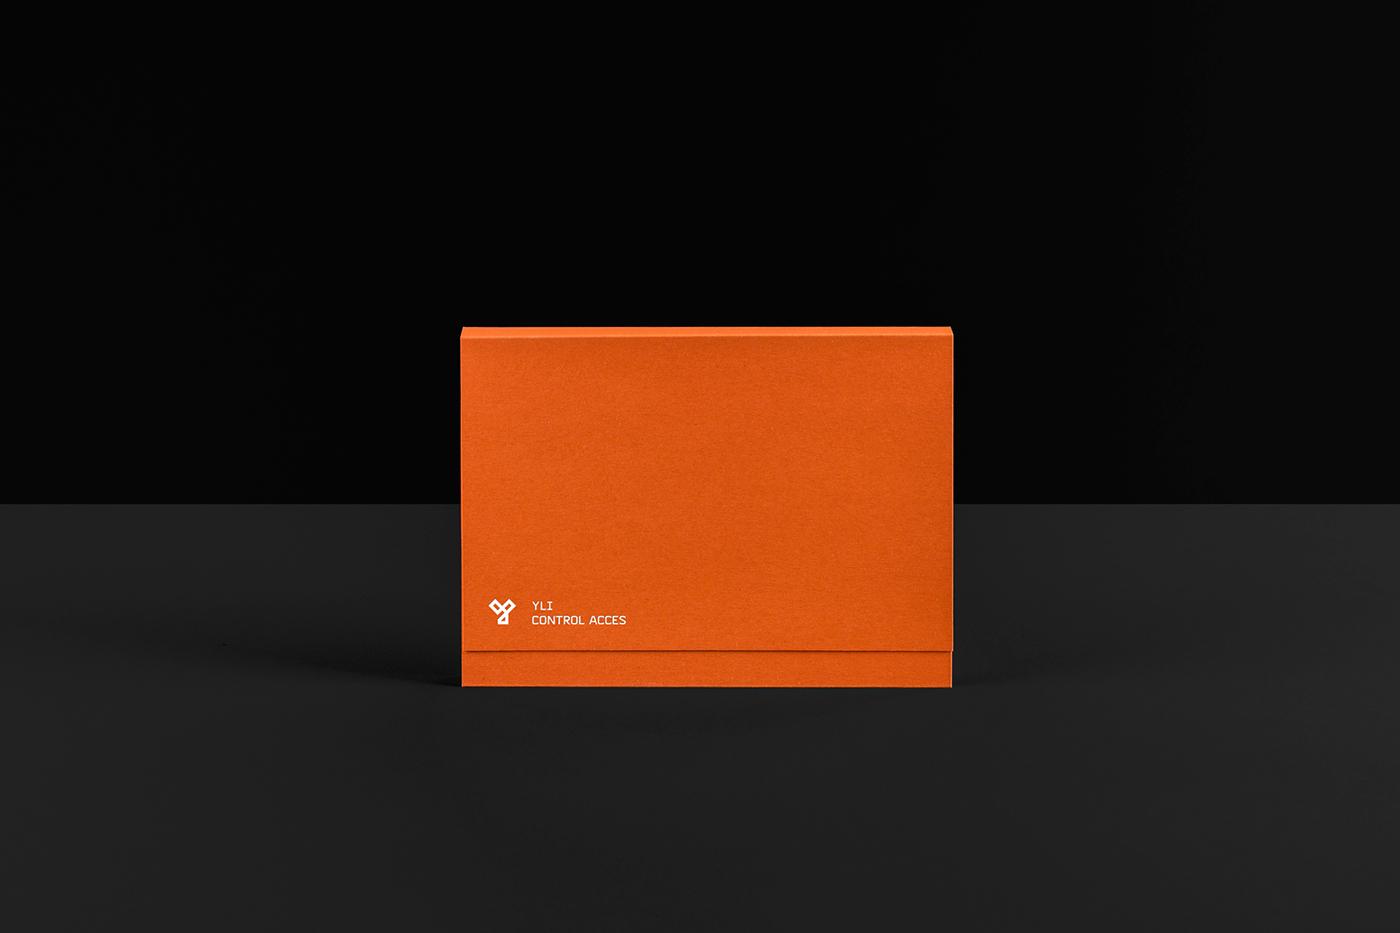 security Board orange electronic camera locks gray hotfoil rectangular budapest